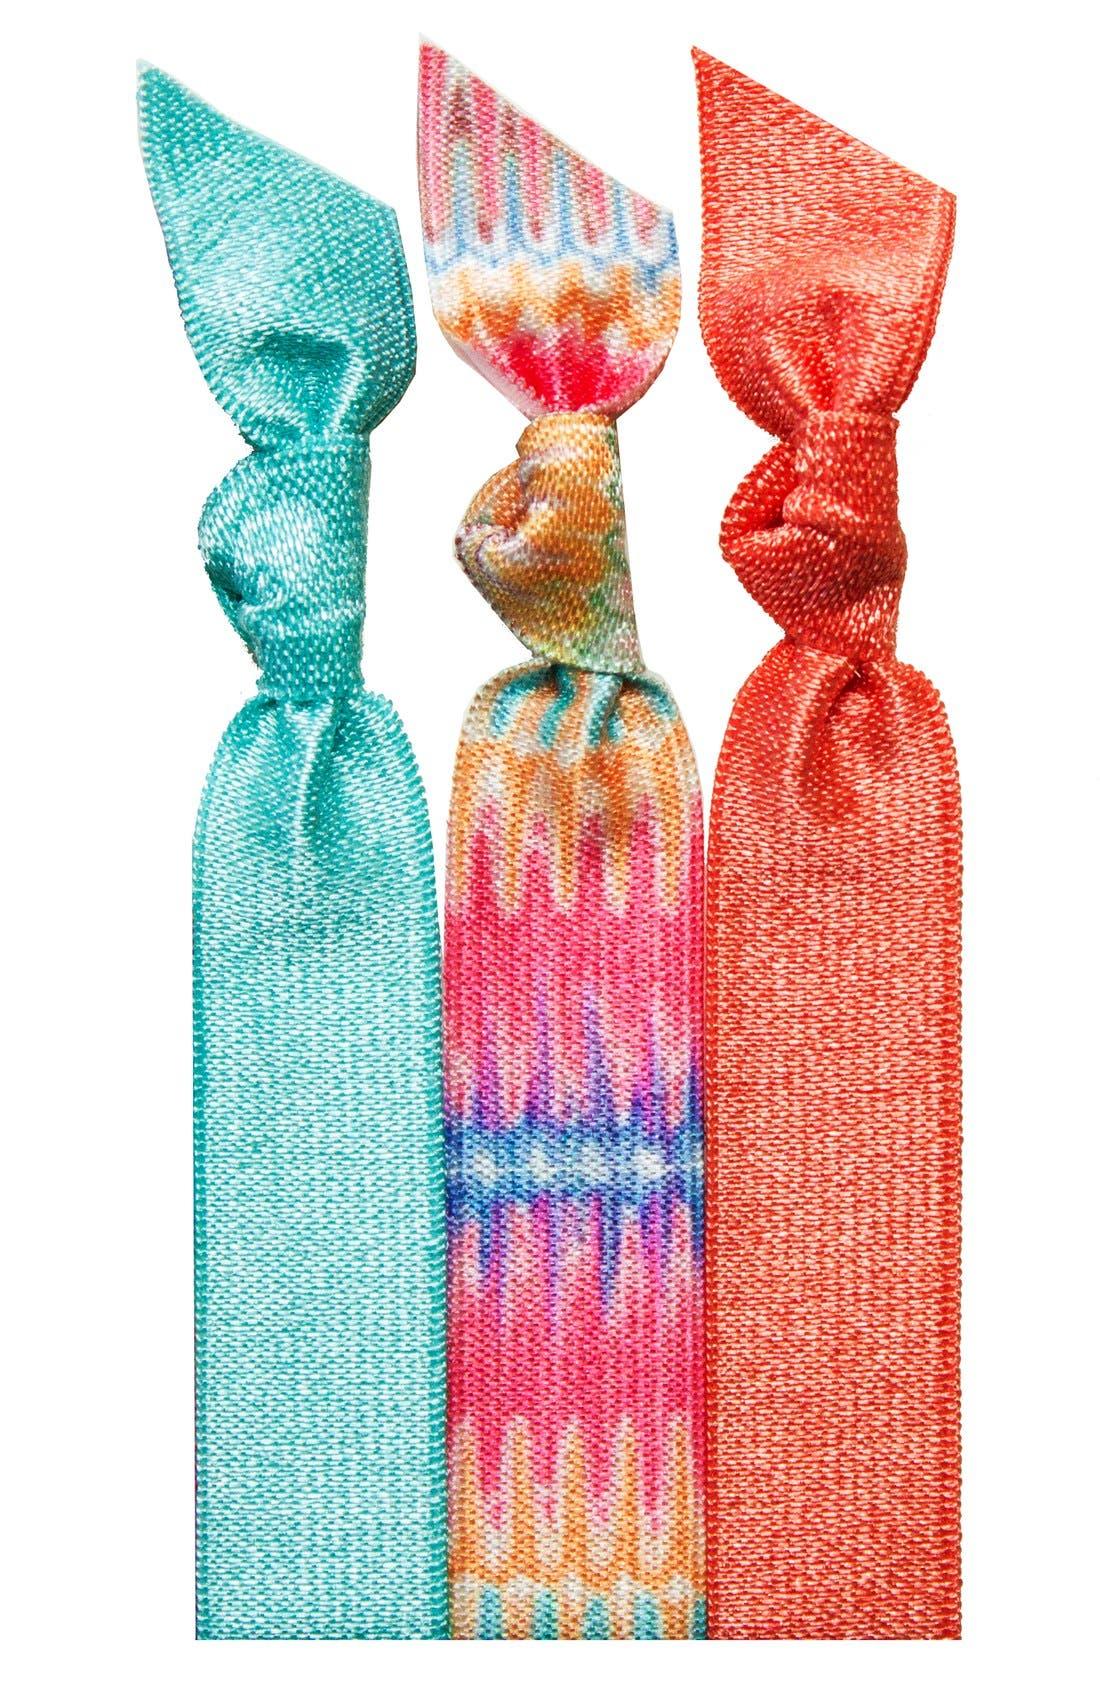 Alternate Image 1 Selected - Emi-Jay 'Desert Sun' Hair Ties (3-Pack)